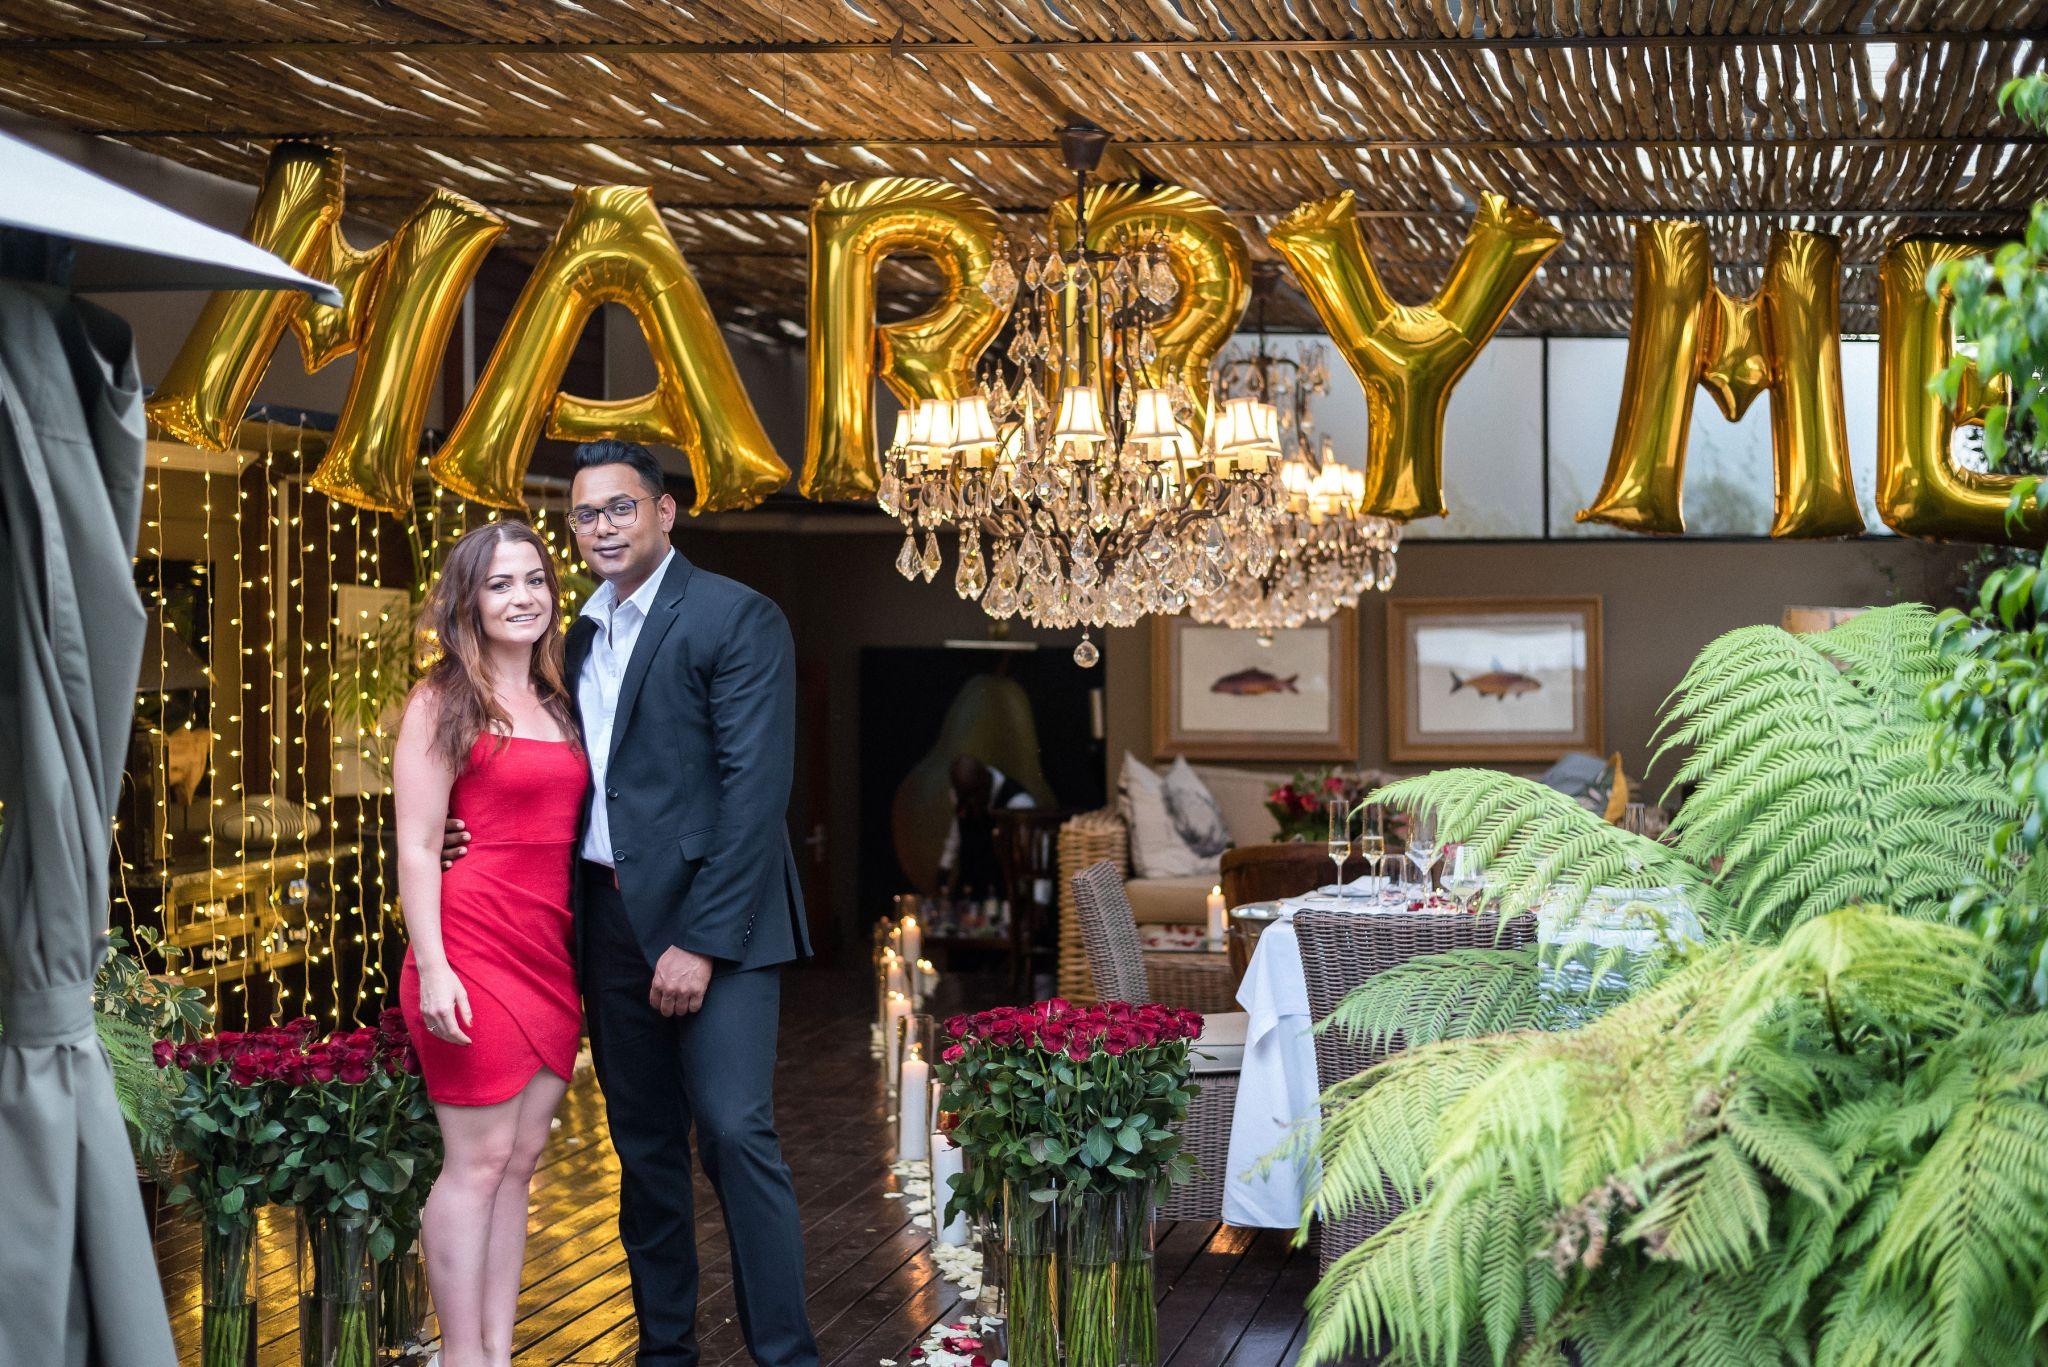 Jehron and Carla's Magical Johannesburg Proposal